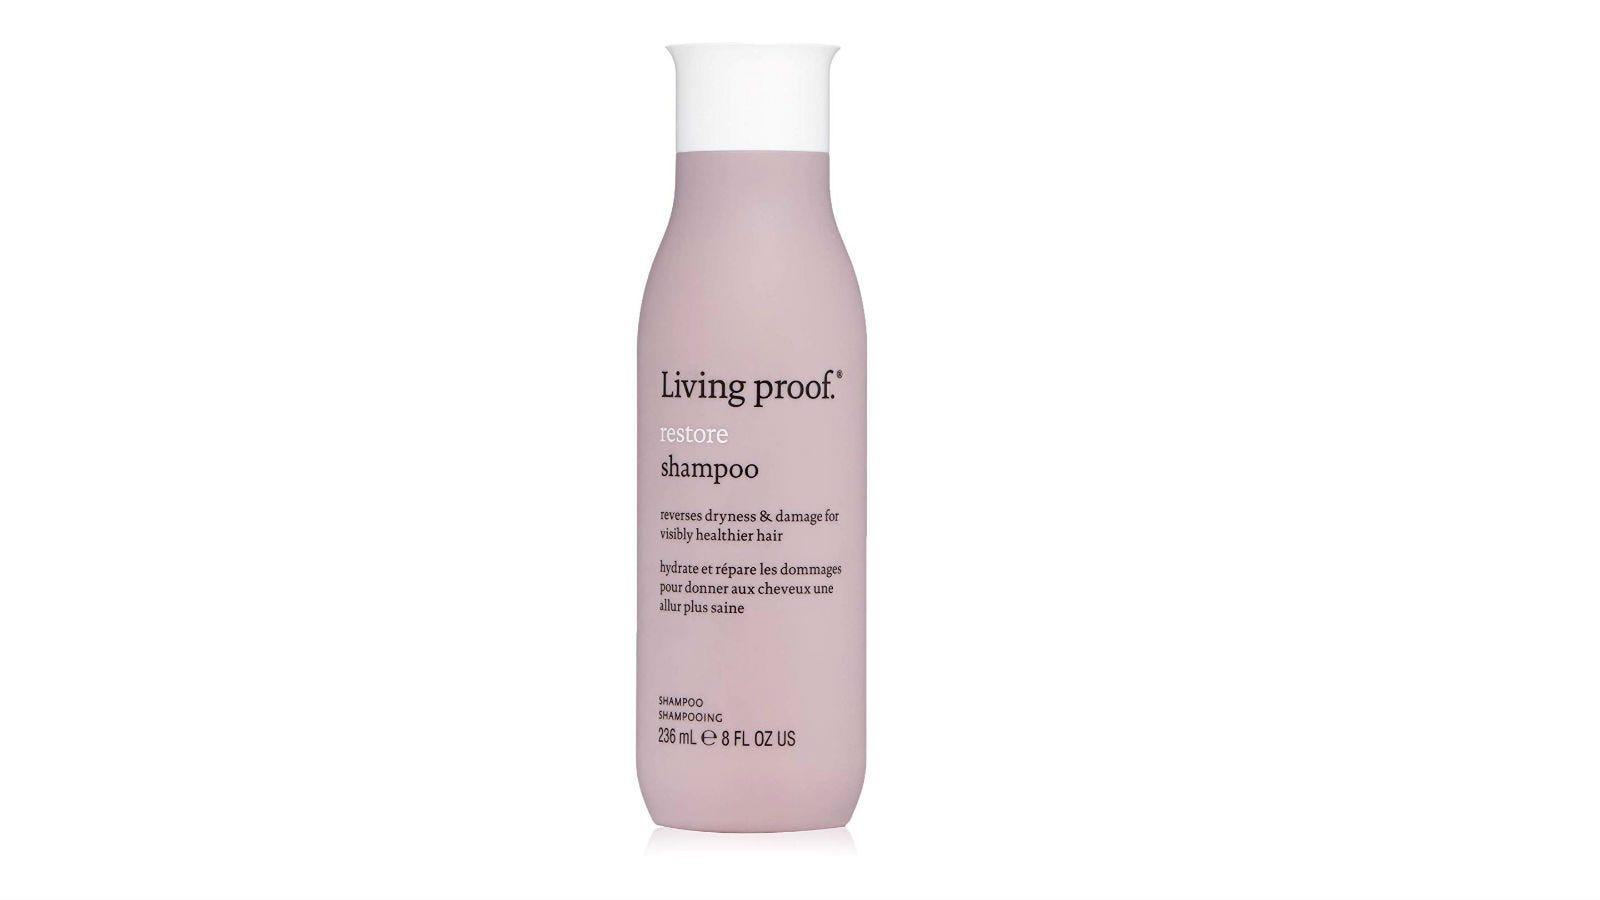 A bottle of Living Proof Restore Shampoo.